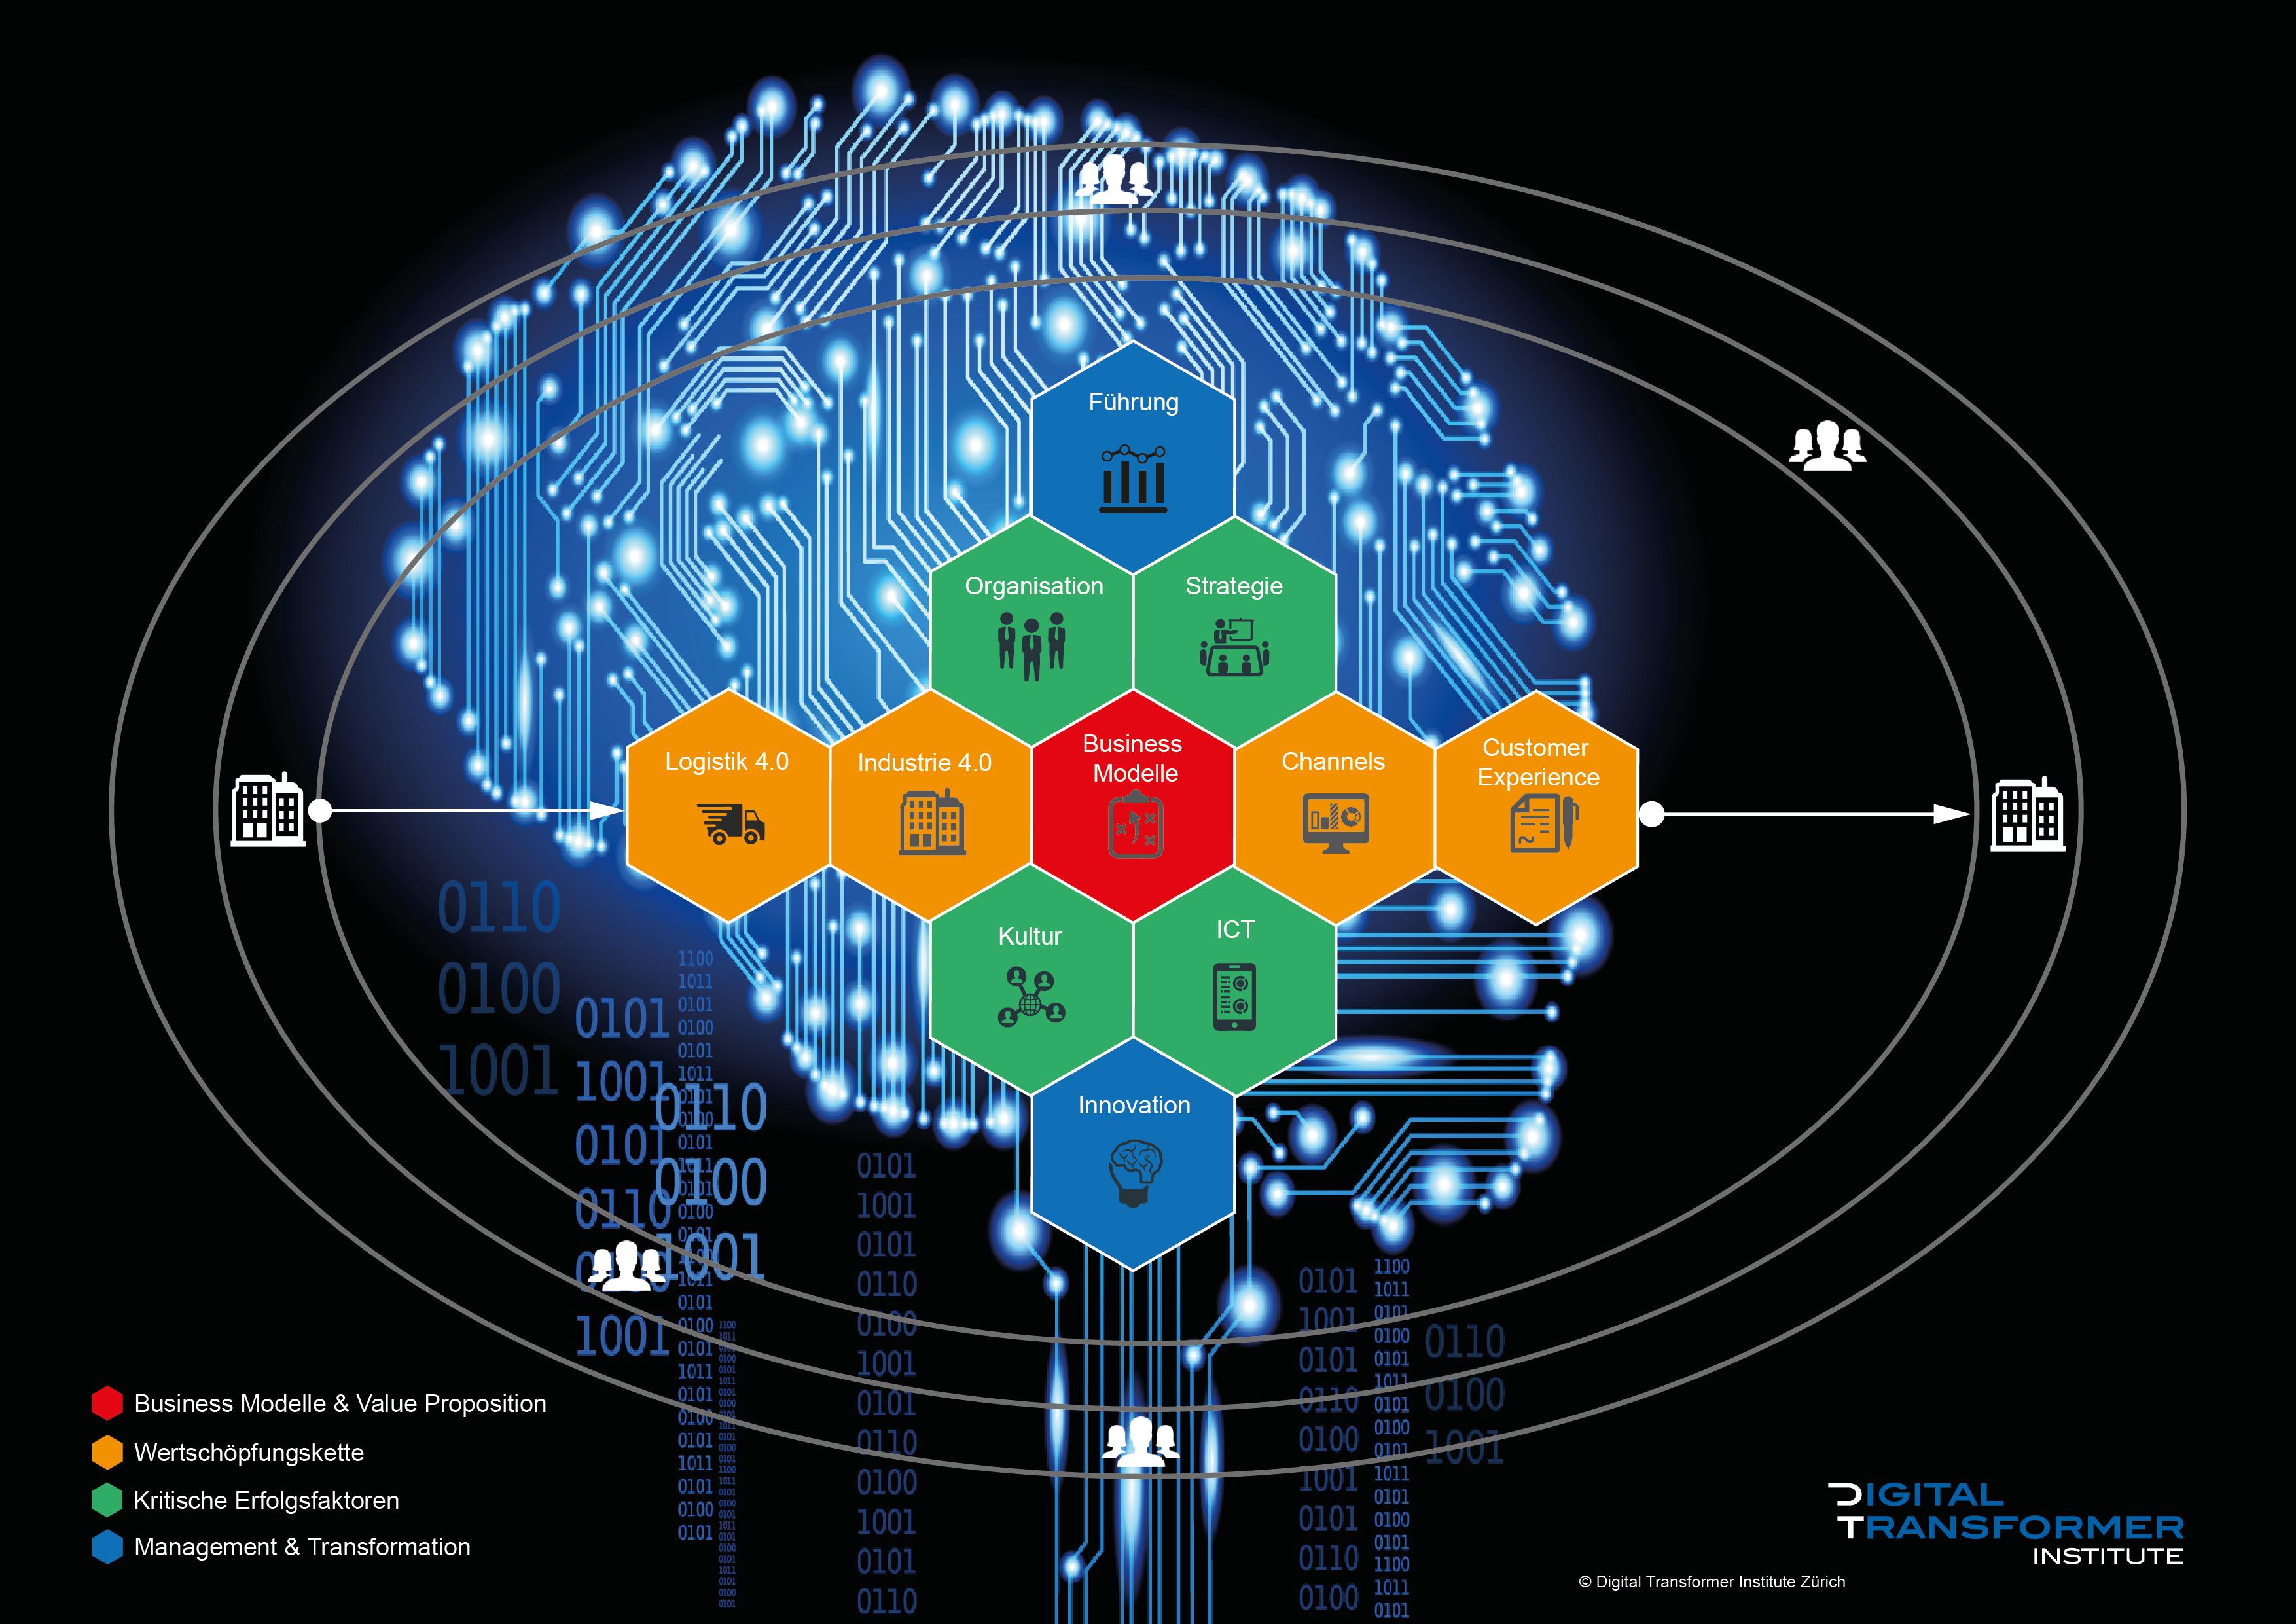 Der Digitale Reifegrad Check basiert auf dem Digital Transformer Institute Framework